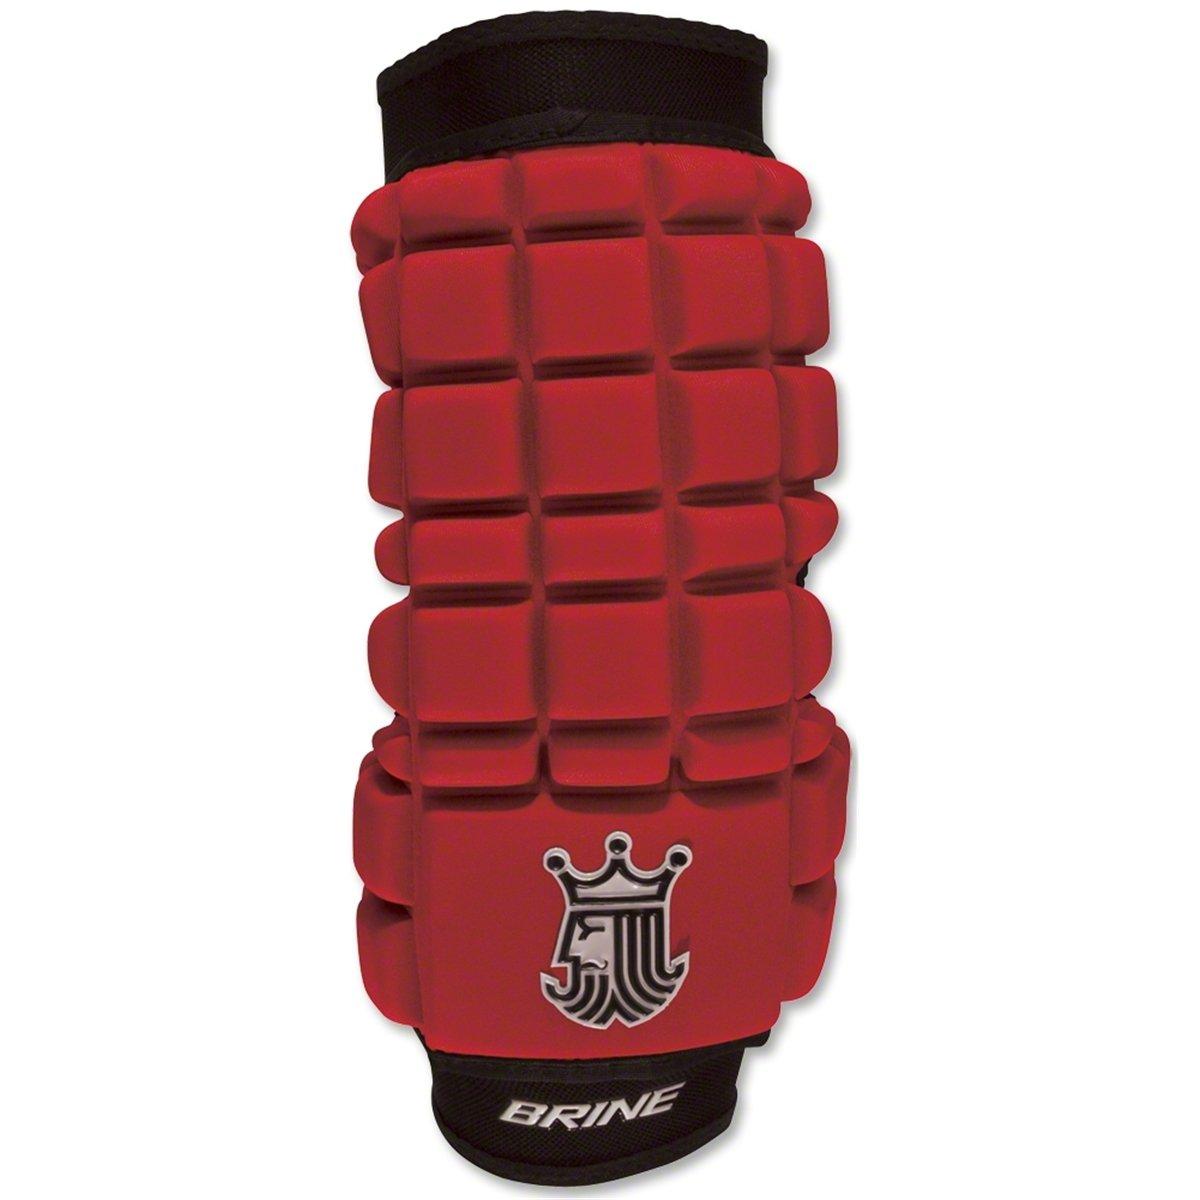 Brine LoPro Superlight Lacrosse Arm Pad